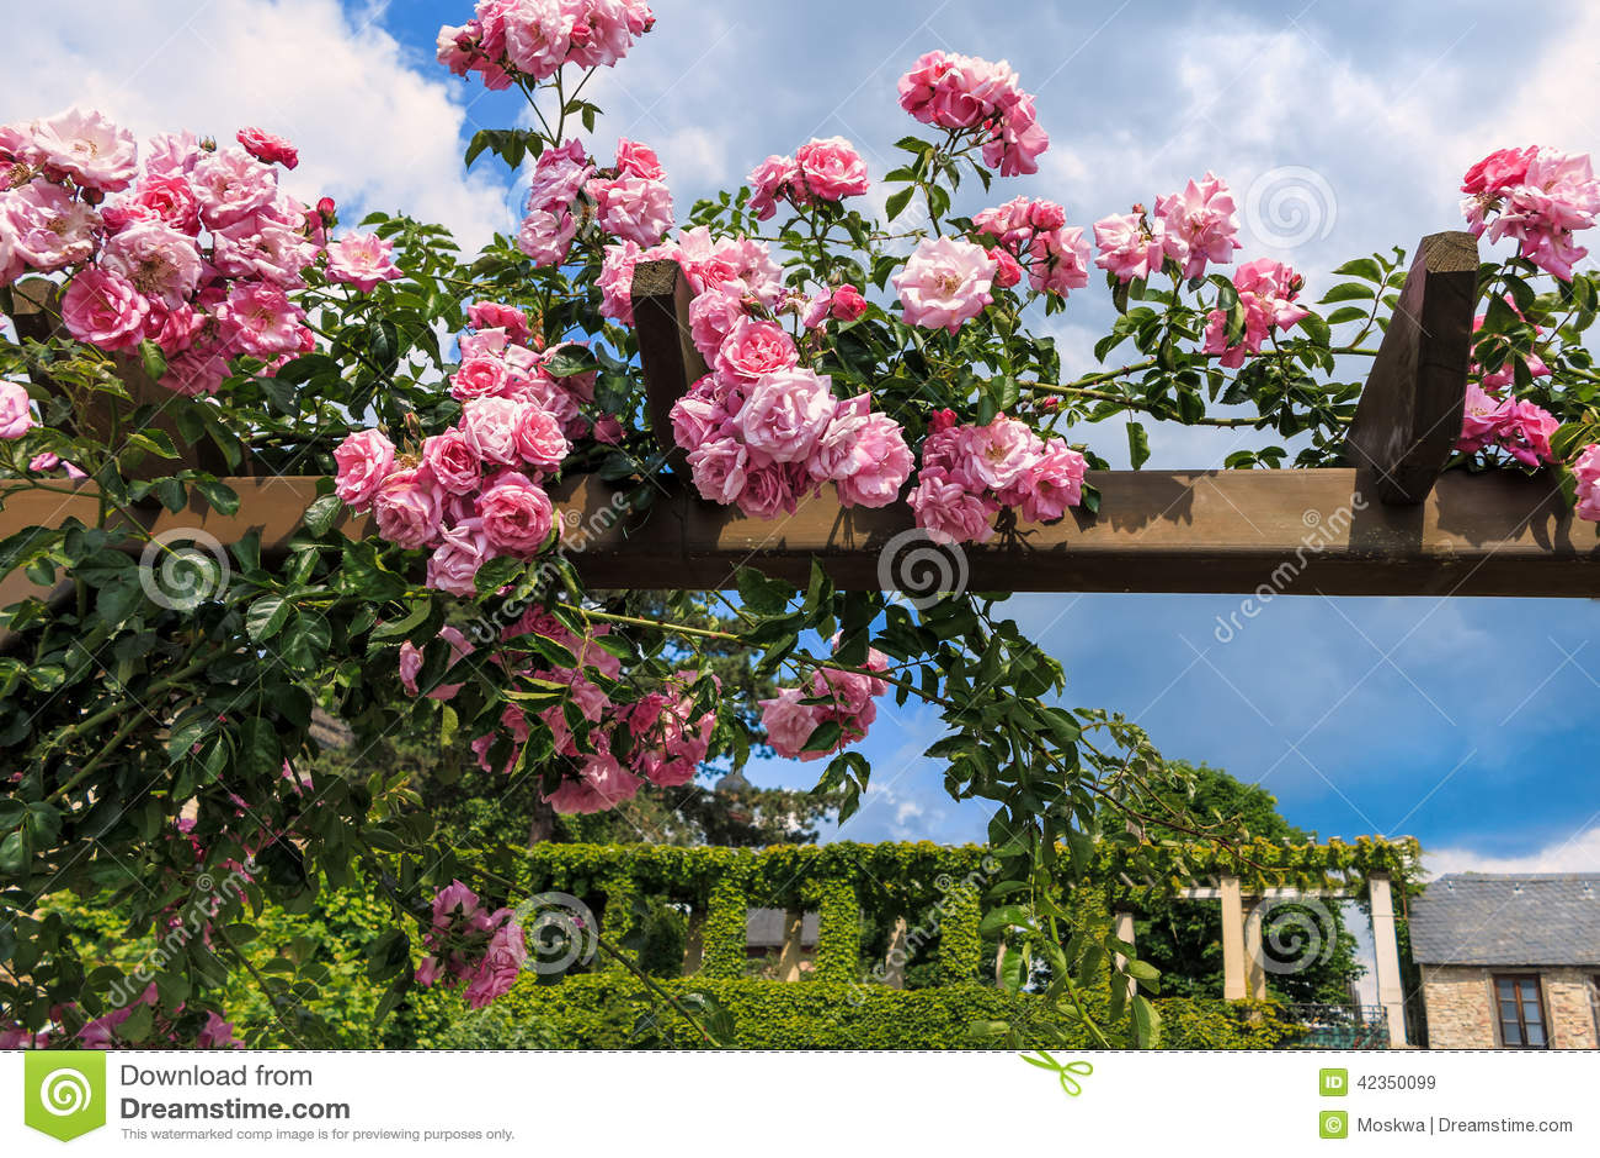 Rosas de escalada corderosa no jardim do castelo de Eltville am